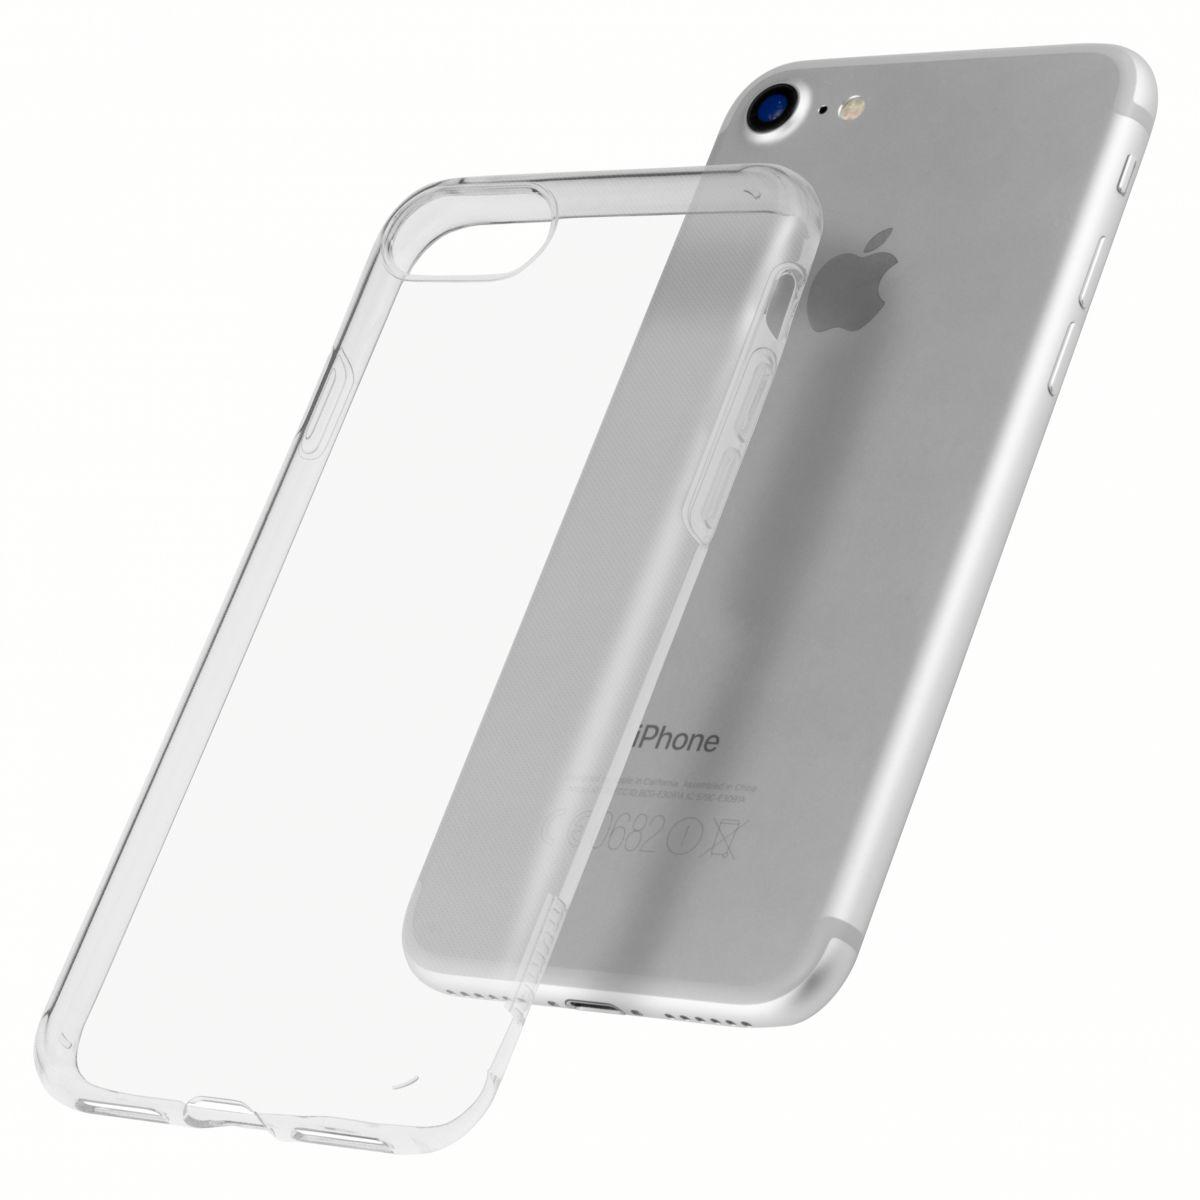 media markt hülle iphone 8